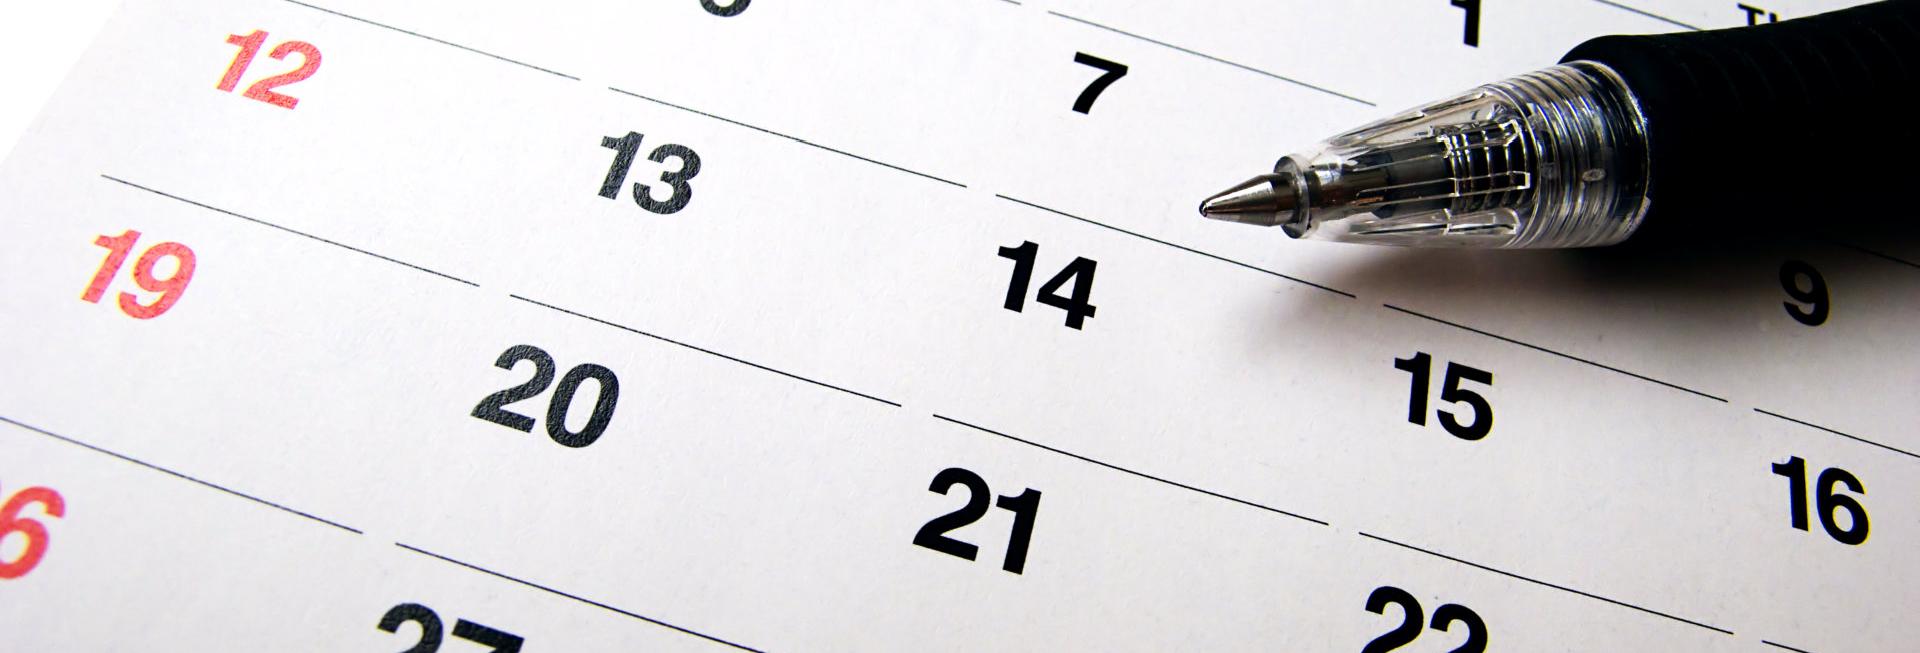 pen in a calendar